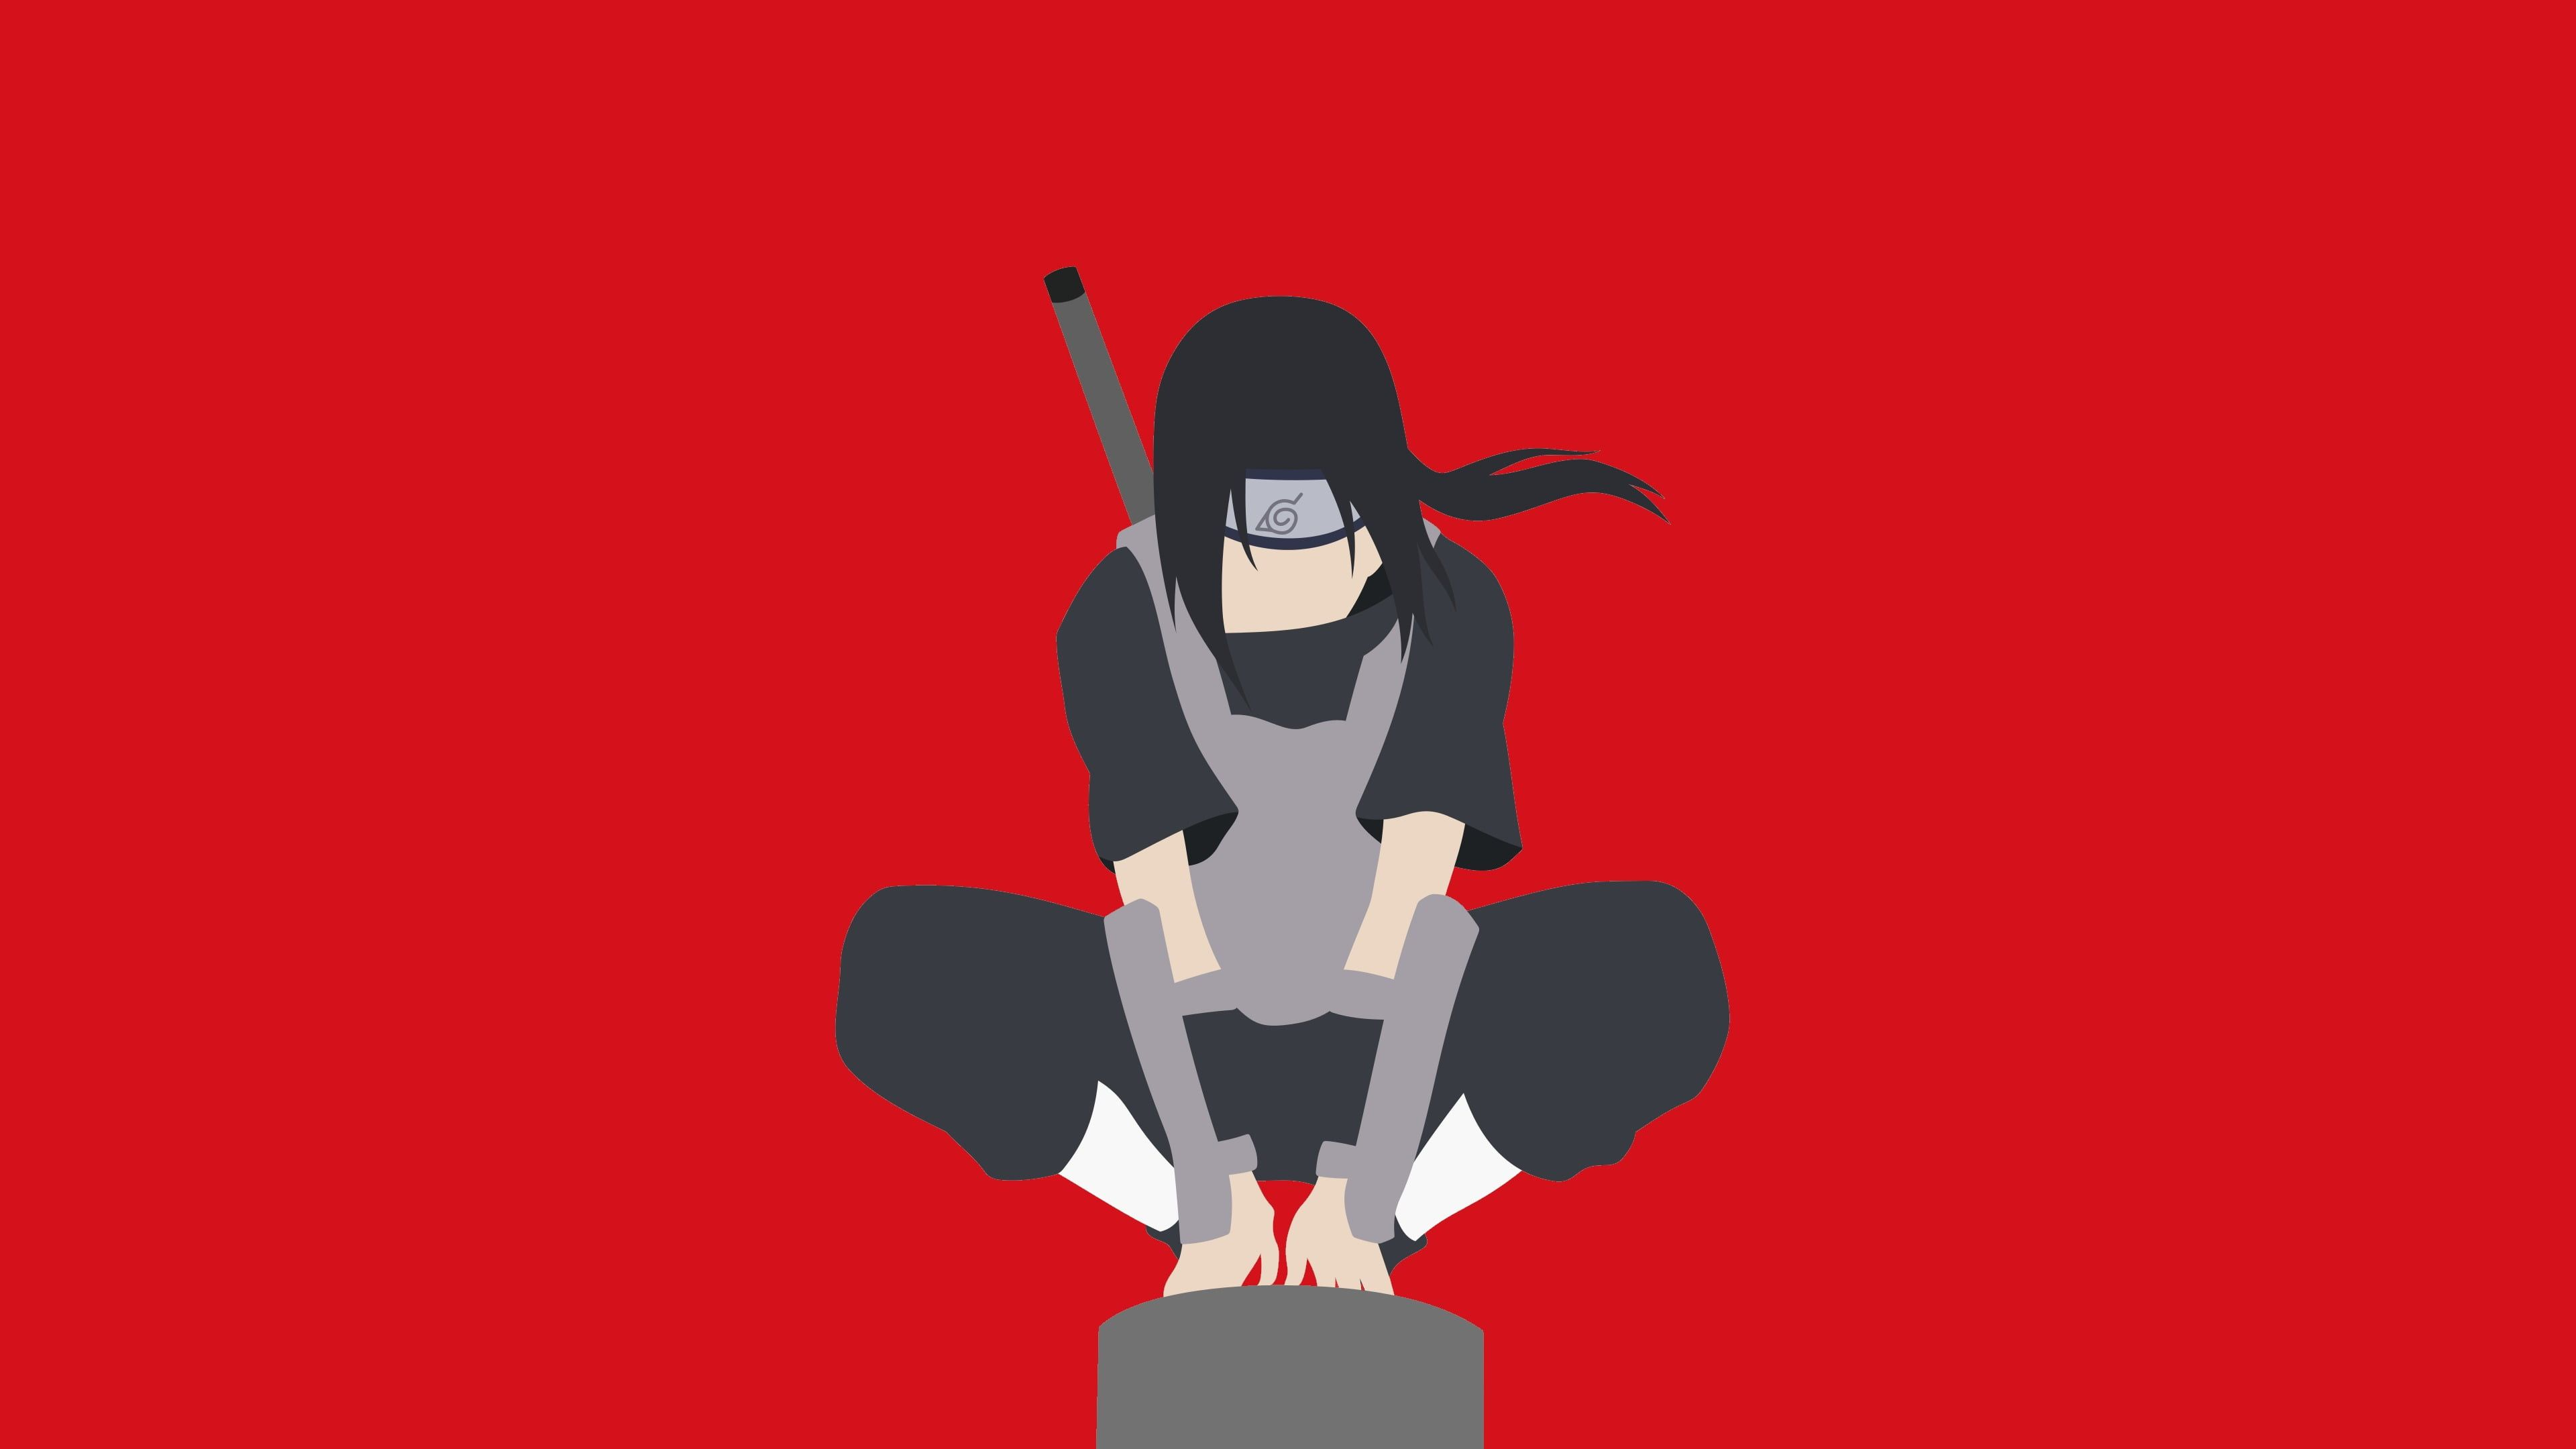 Ninja Illustration Anime Naruto Shippuuden Minimalism Uchiha Itachi 4k Wallpaper Hdwallpaper Desktop In 2020 Anime Bilder Itachi Itachi Uchiha